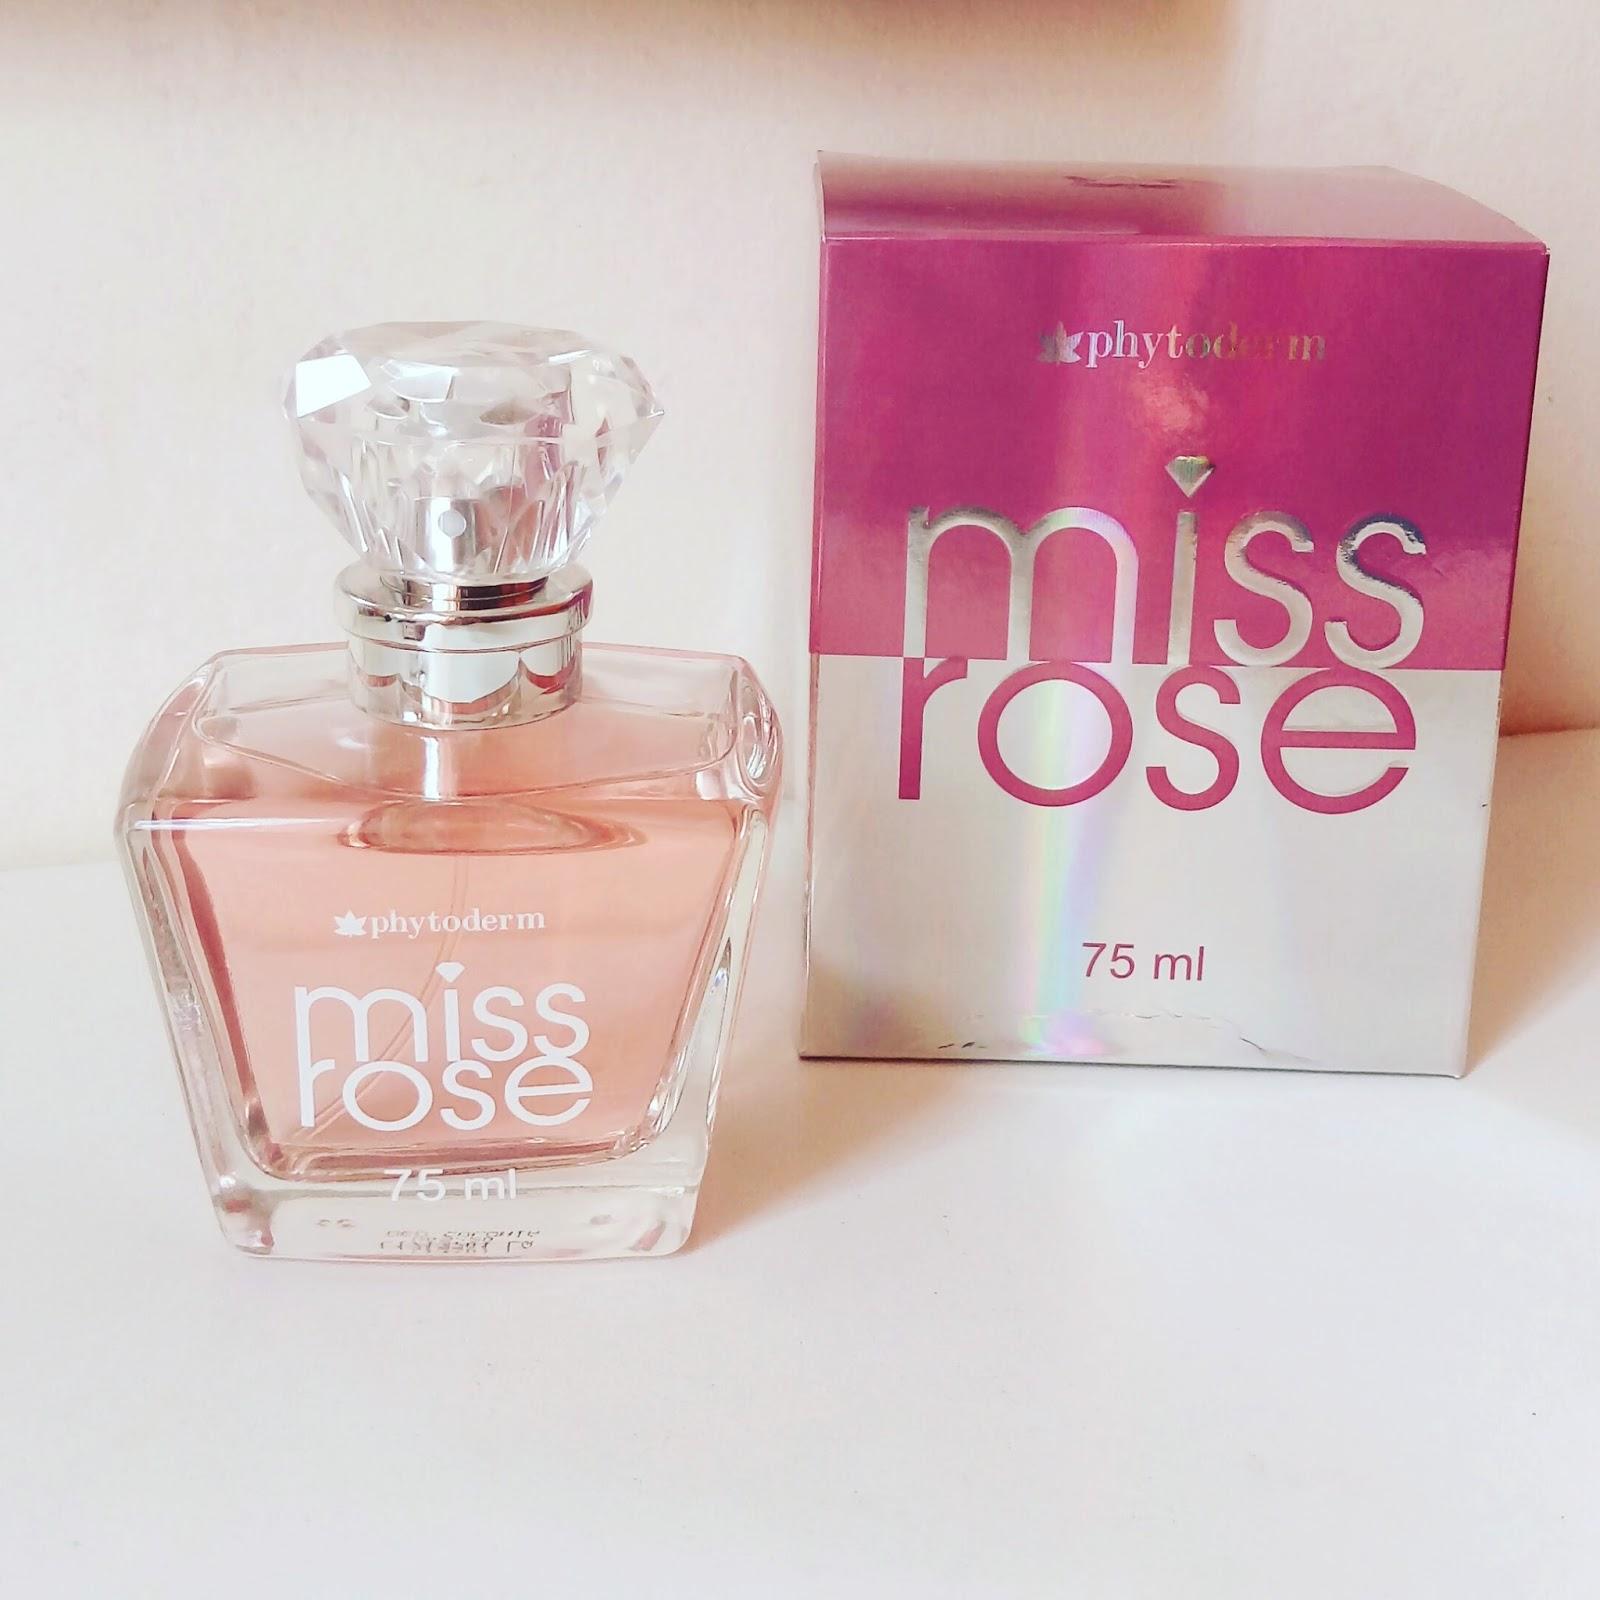 DEO COL PHYT FEMIN 75ML MISS ROSE